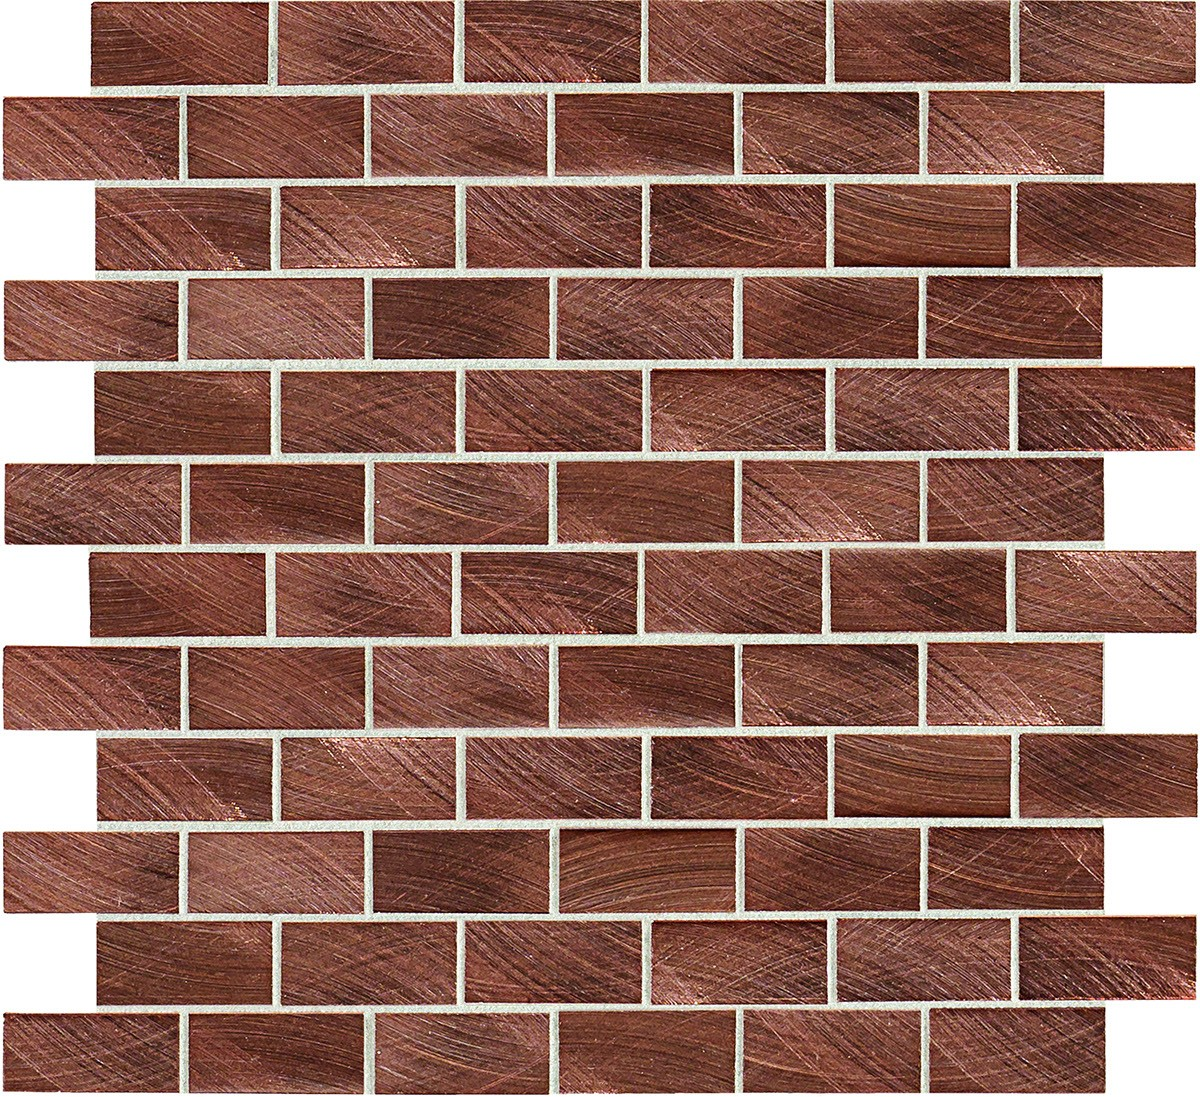 ST71 Copper Mosaic brick joint